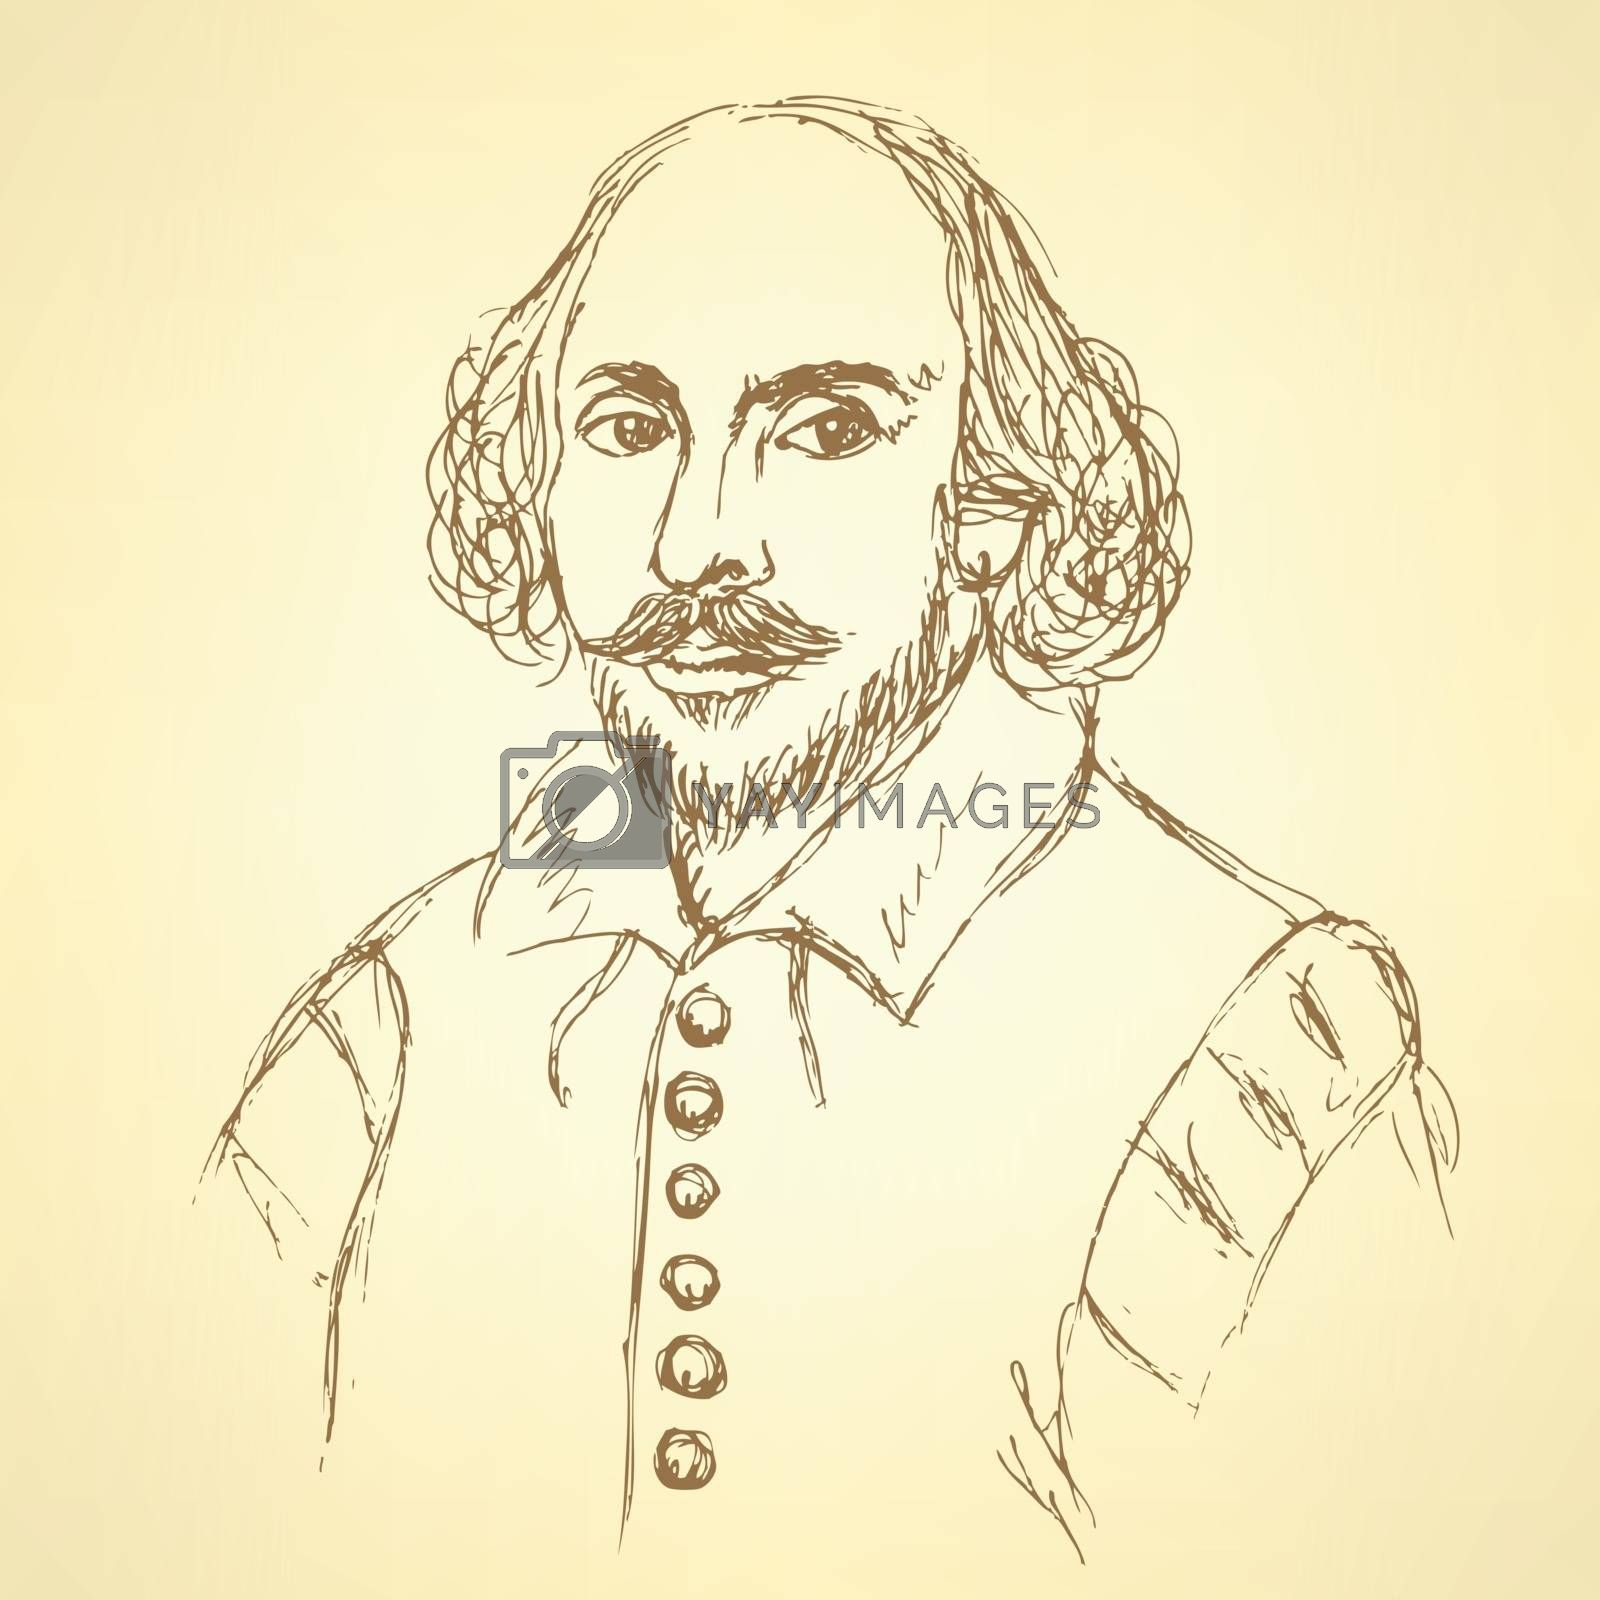 Sketch William Shakespeare portrait in vintage style, vector